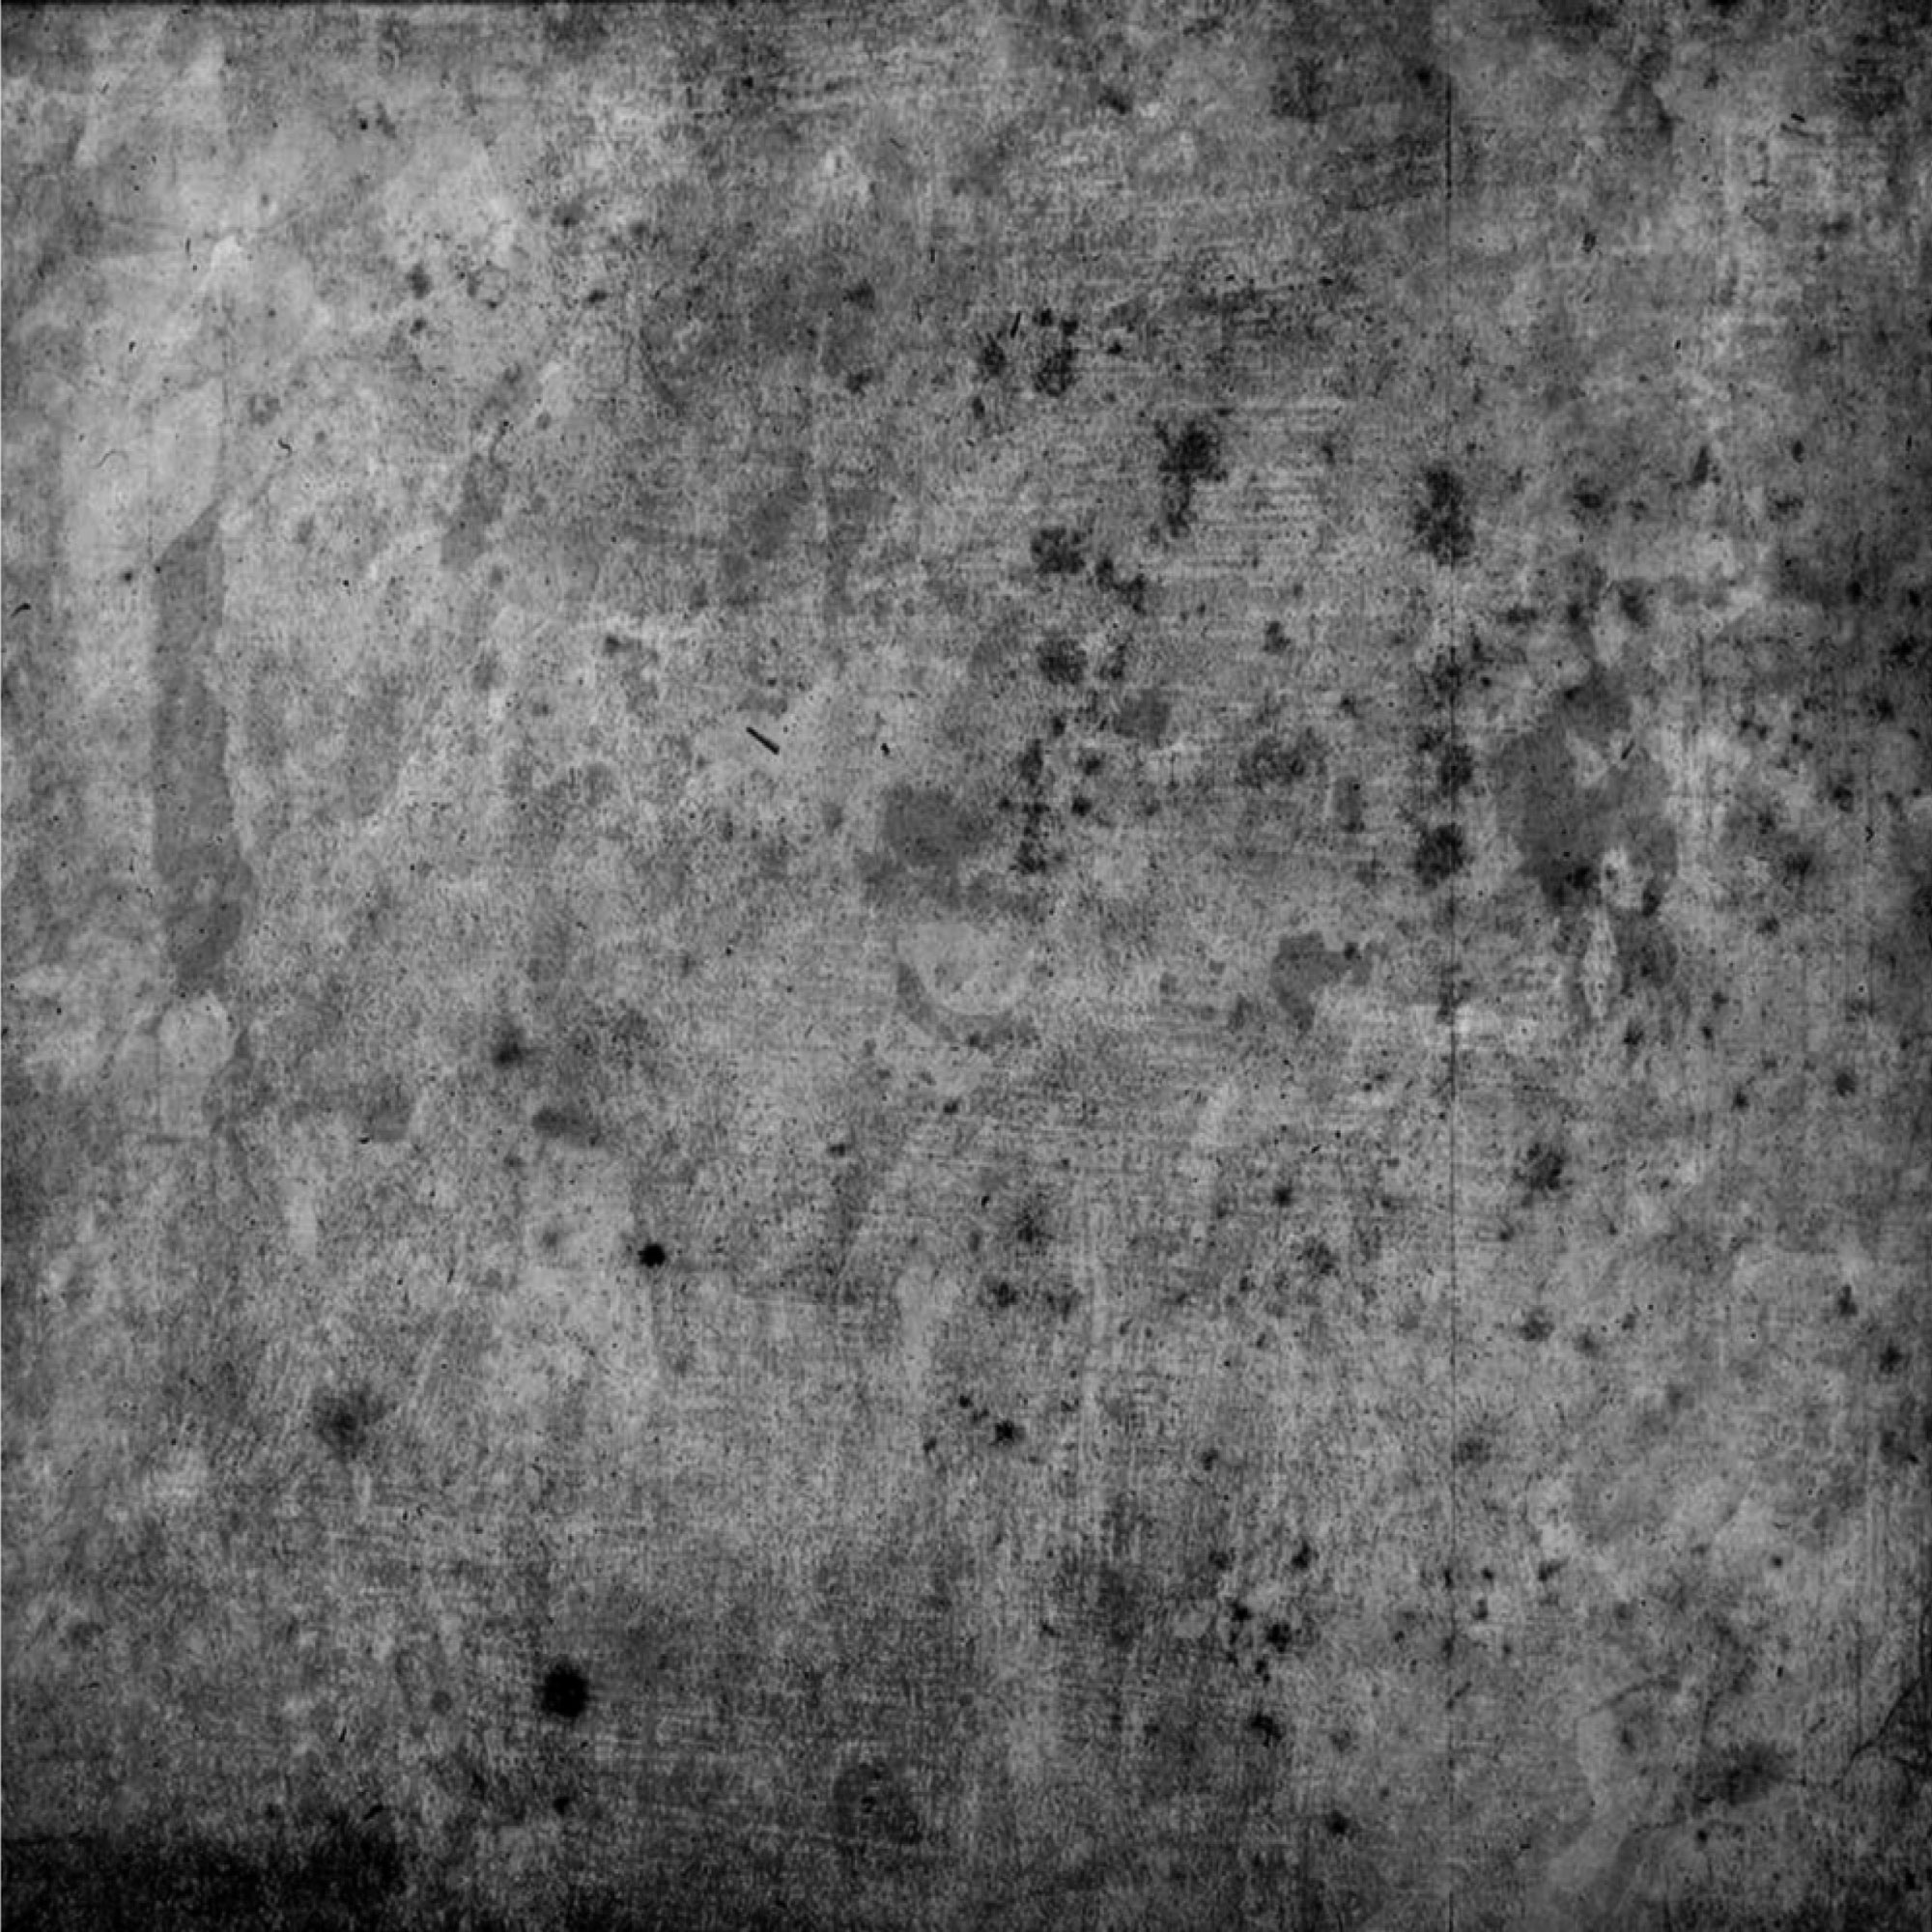 Kaeba —Ianurek 5.0 X 100